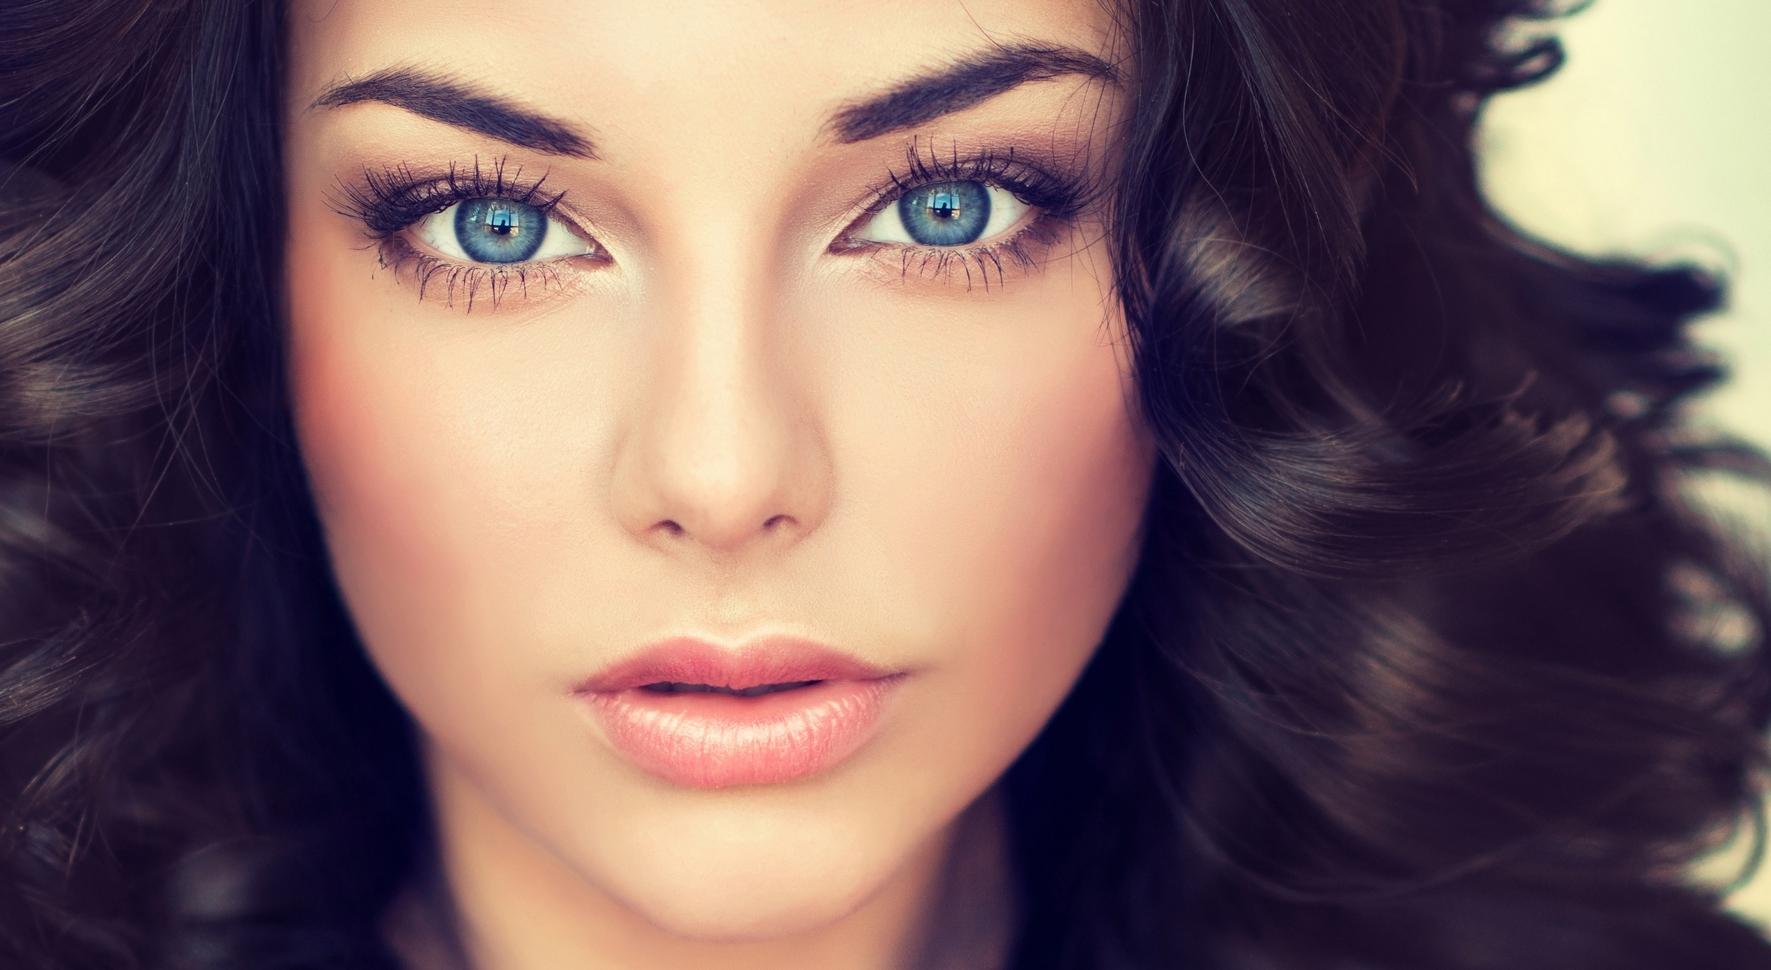 Best Eye Shadow Colors For Blue Eyes   Lovetoknow with regard to Best Eyeshadow Color For Blue Eyes And Dark Hair